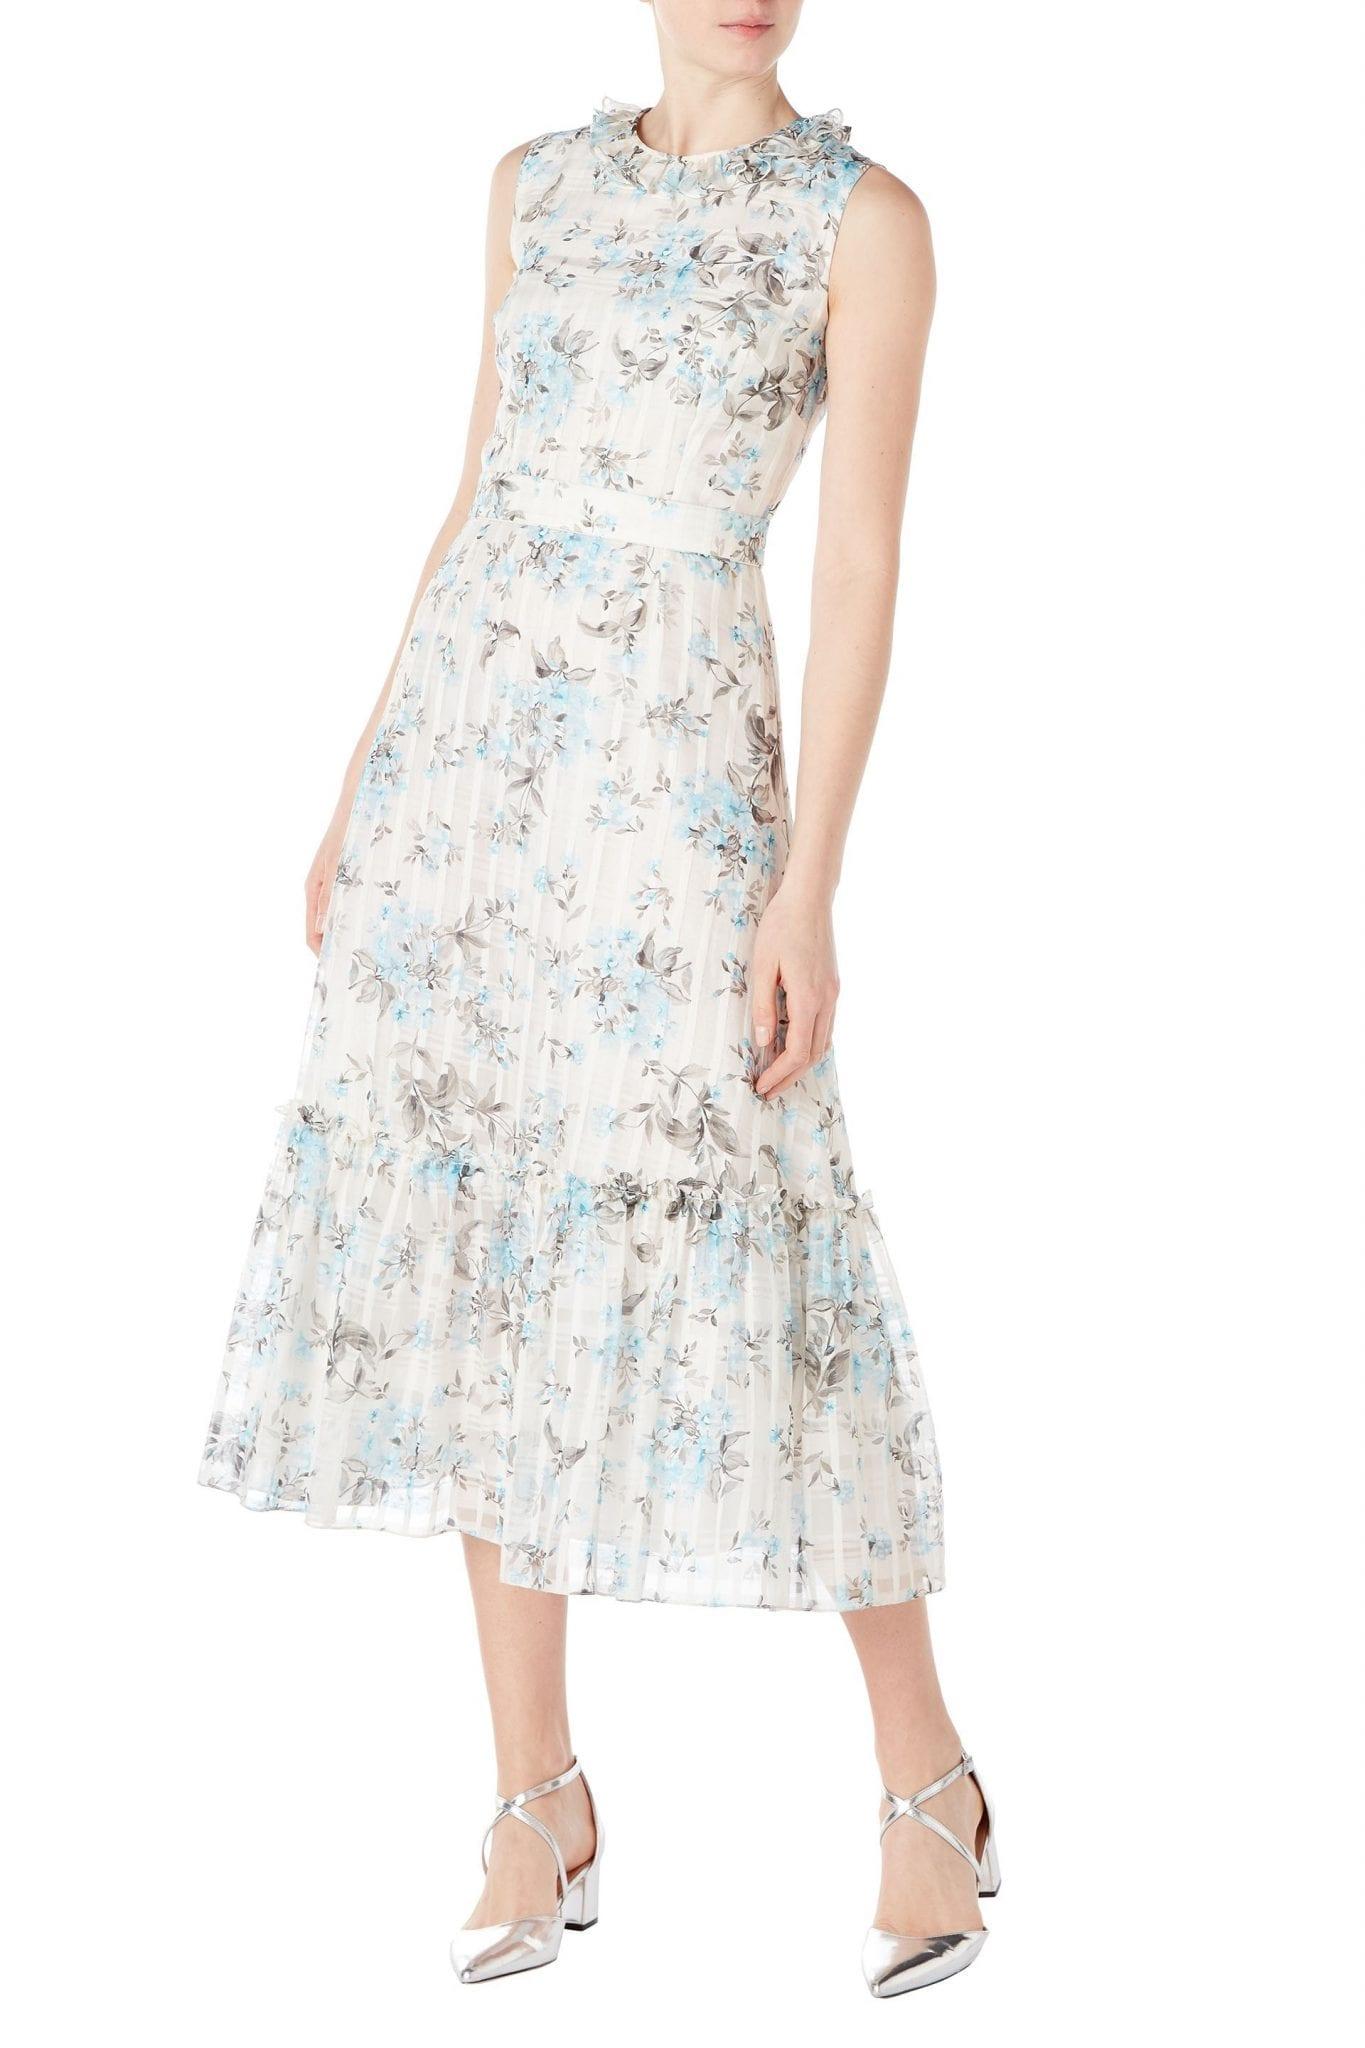 GOAT FASHION July Flower Check Dress